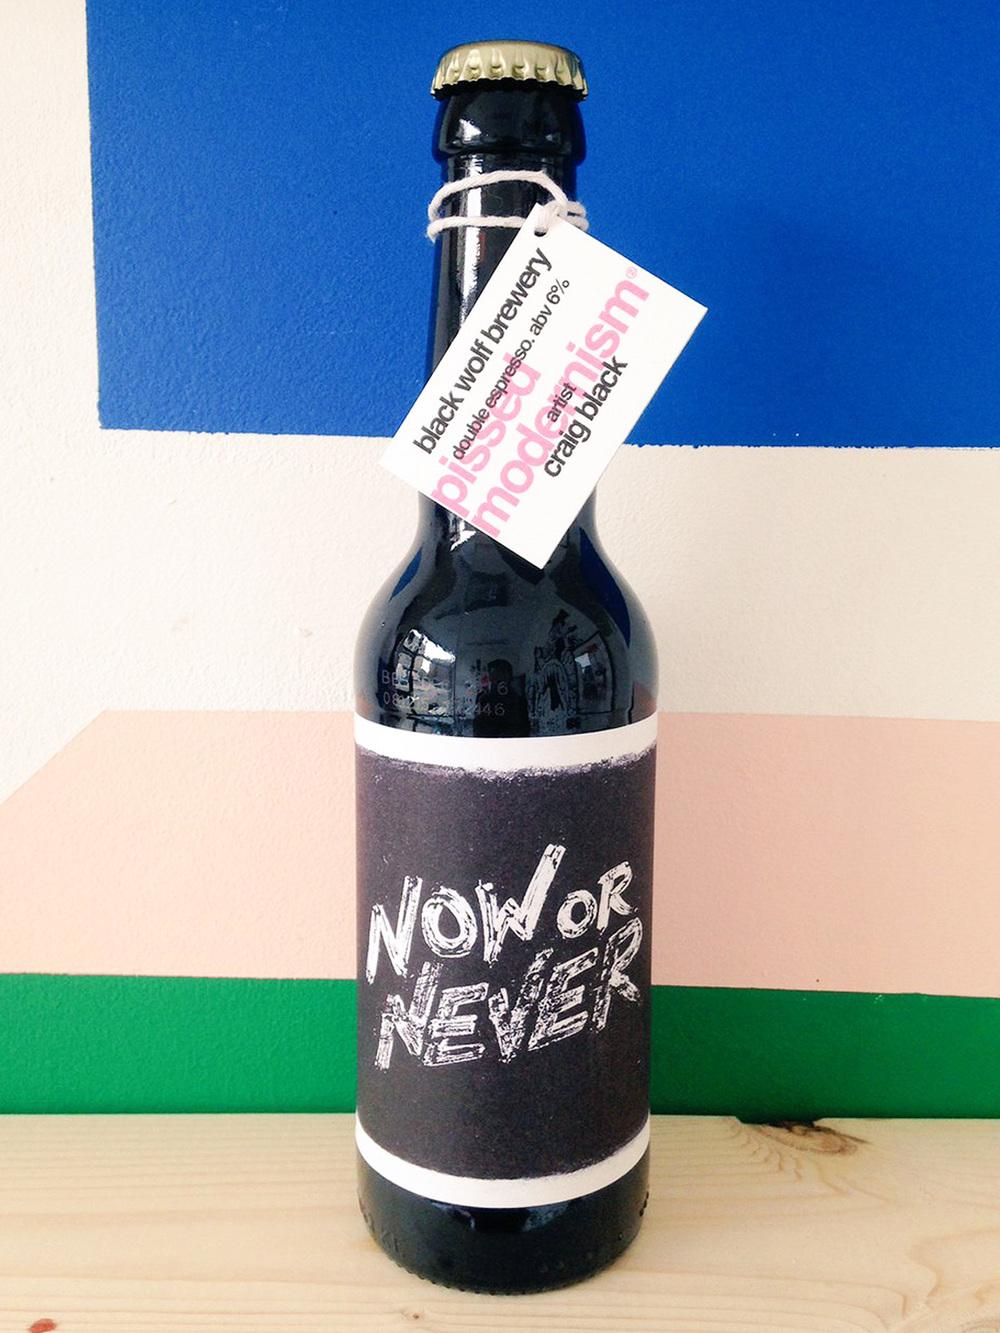 bottle-packaging-craig-black-now-or-never